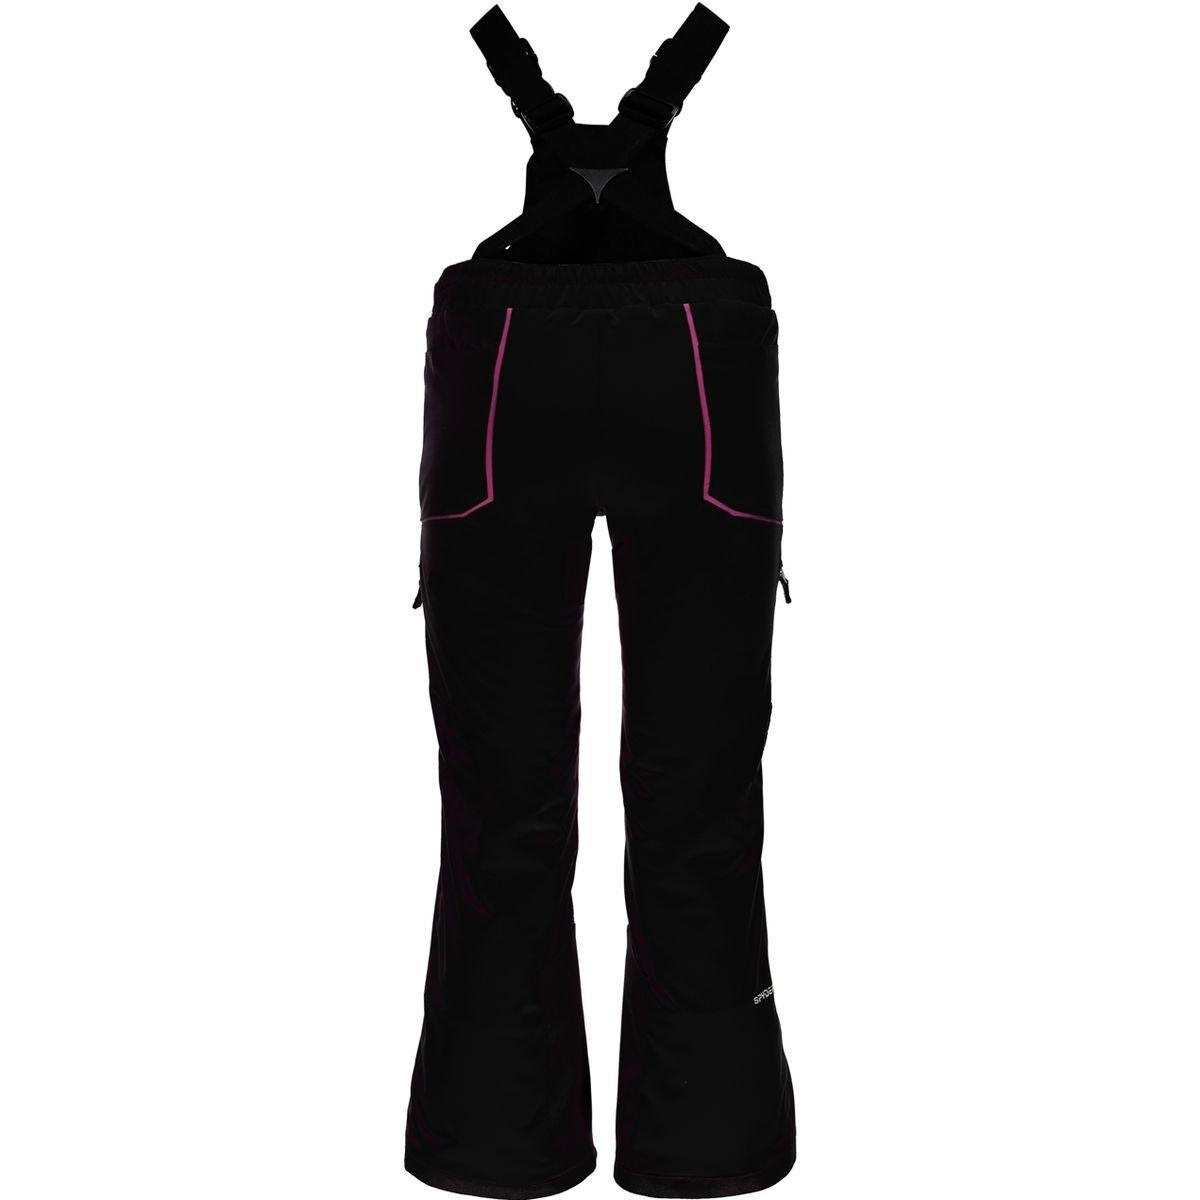 Spyder Kids Girl's Mimi Overall Pants (Big Kids) Black/Raspberry 14 by Spyder (Image #1)